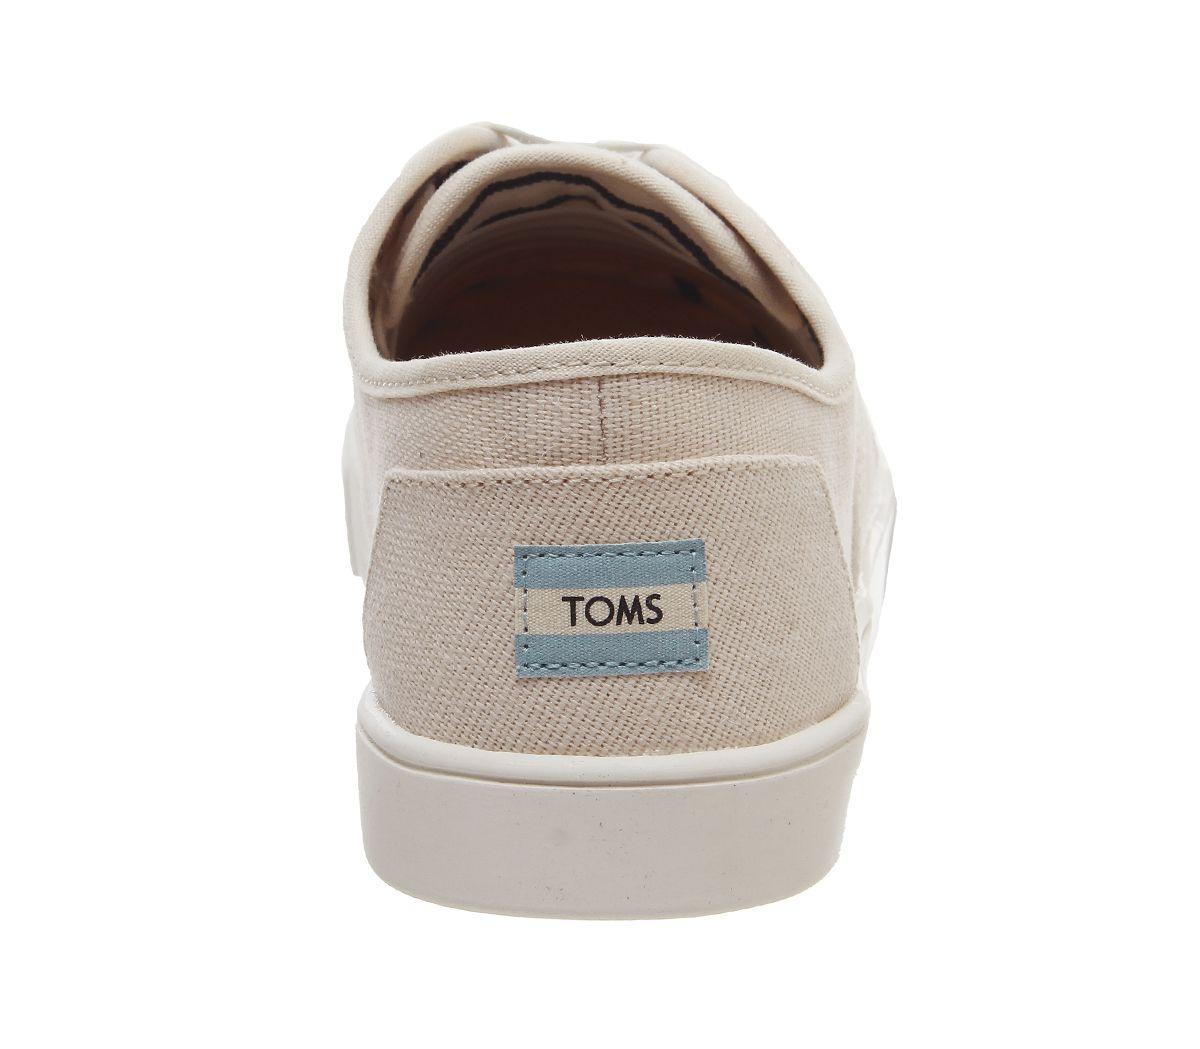 Da-Uomo-Toms-Cordones-Scarpe-da-ginnastica-Naturale-Scarpe-Casual miniatura 4